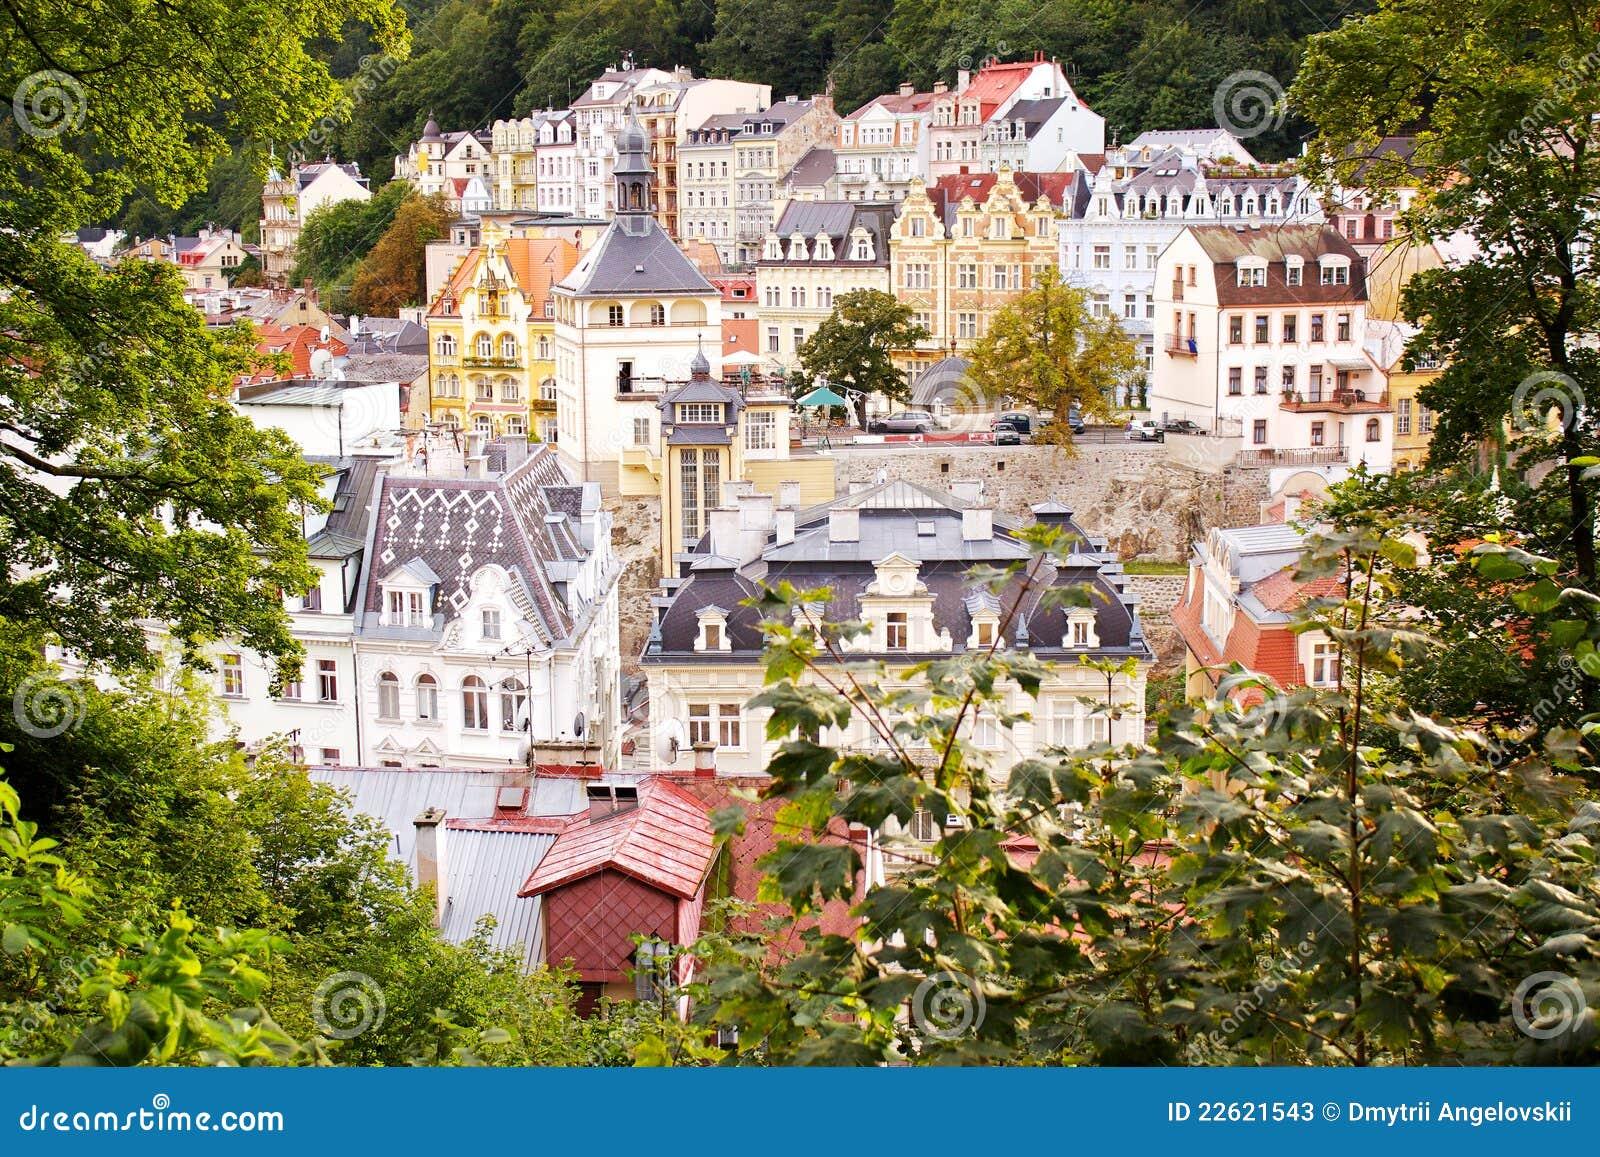 City view of Karlovy Vary